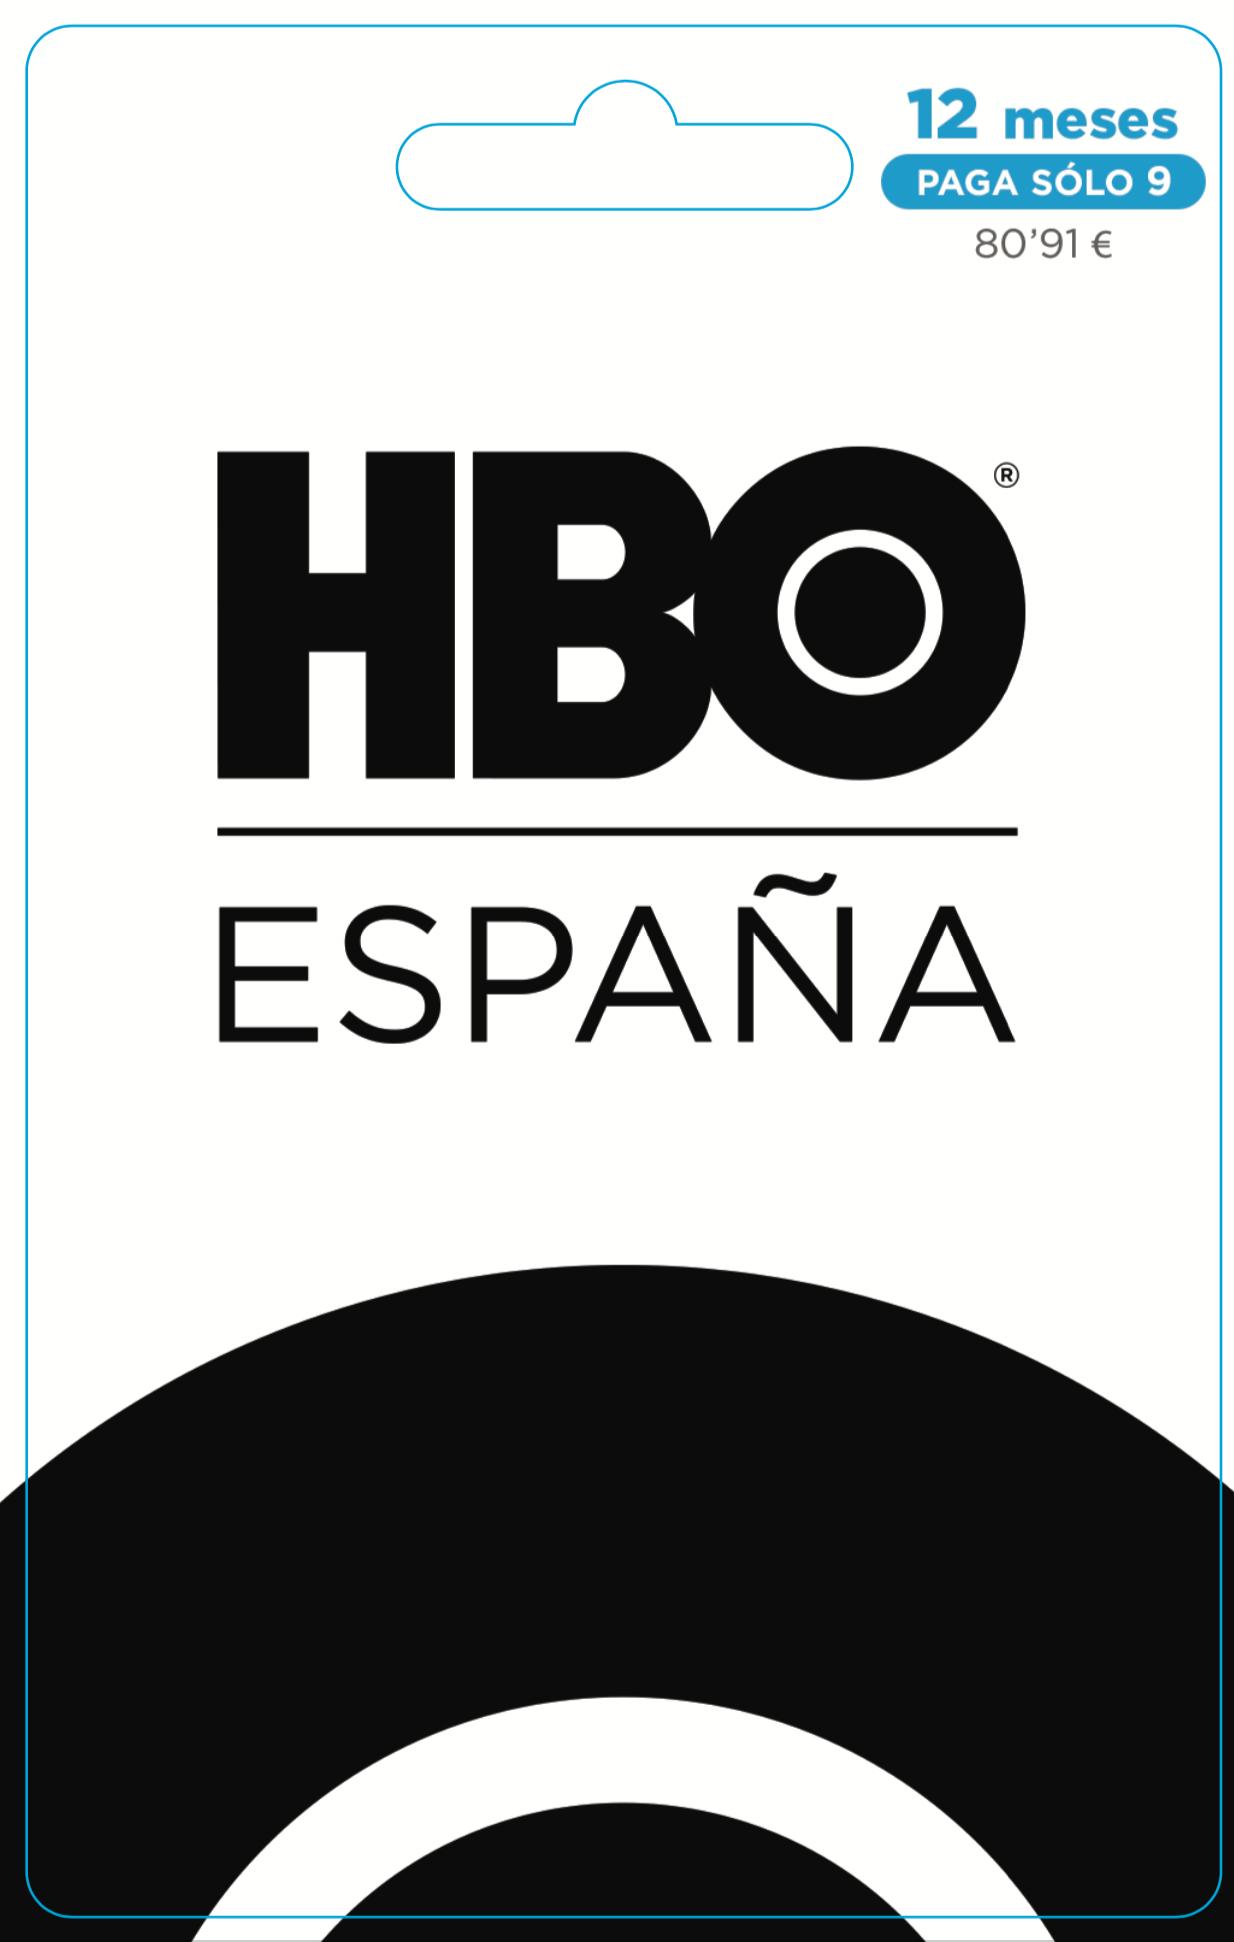 HBO Paga 9, llévate 12